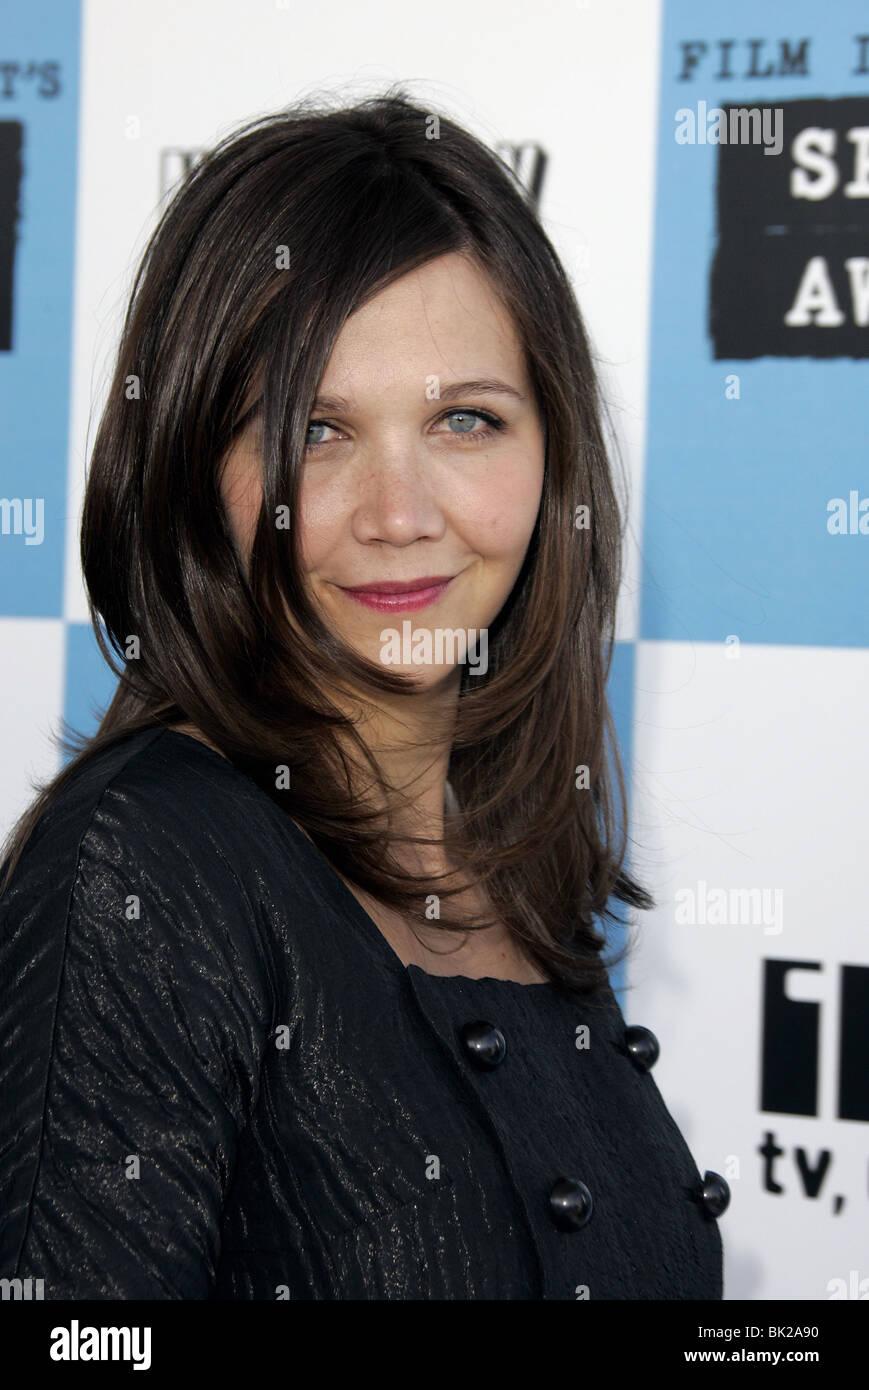 MAGGIE GYLLENHAAL 22ND FILM INDEPENDENT SPIRIT AWARDS SANTA MONICA LOS ANGELES USA 24 February 2007 - Stock Image